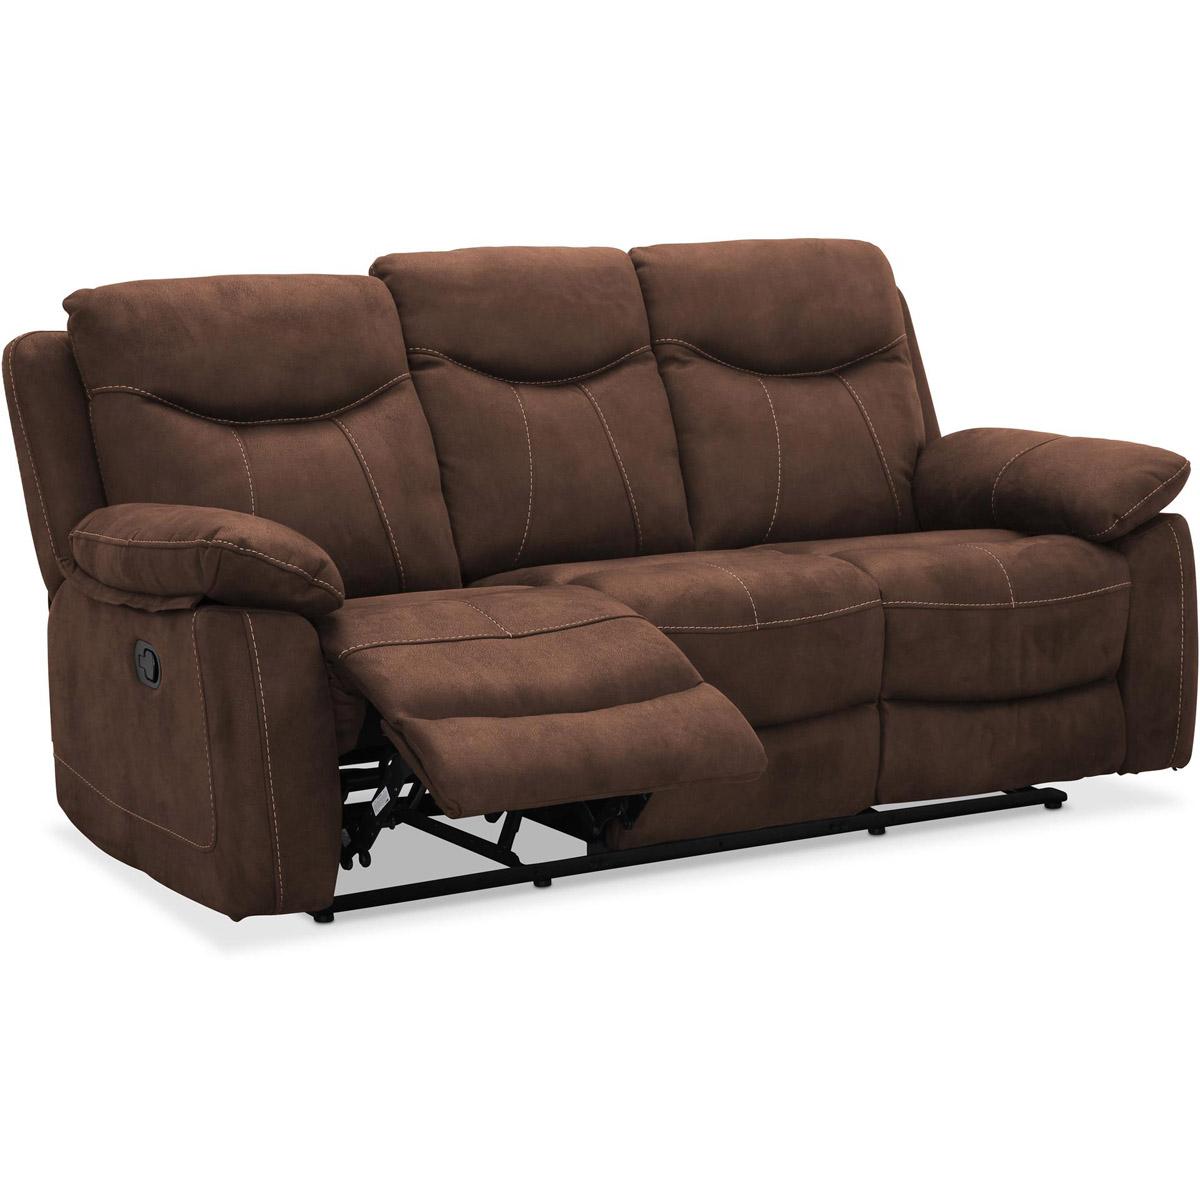 Boston 3-sitssoffa recliner brun micro vinkel fotstöd